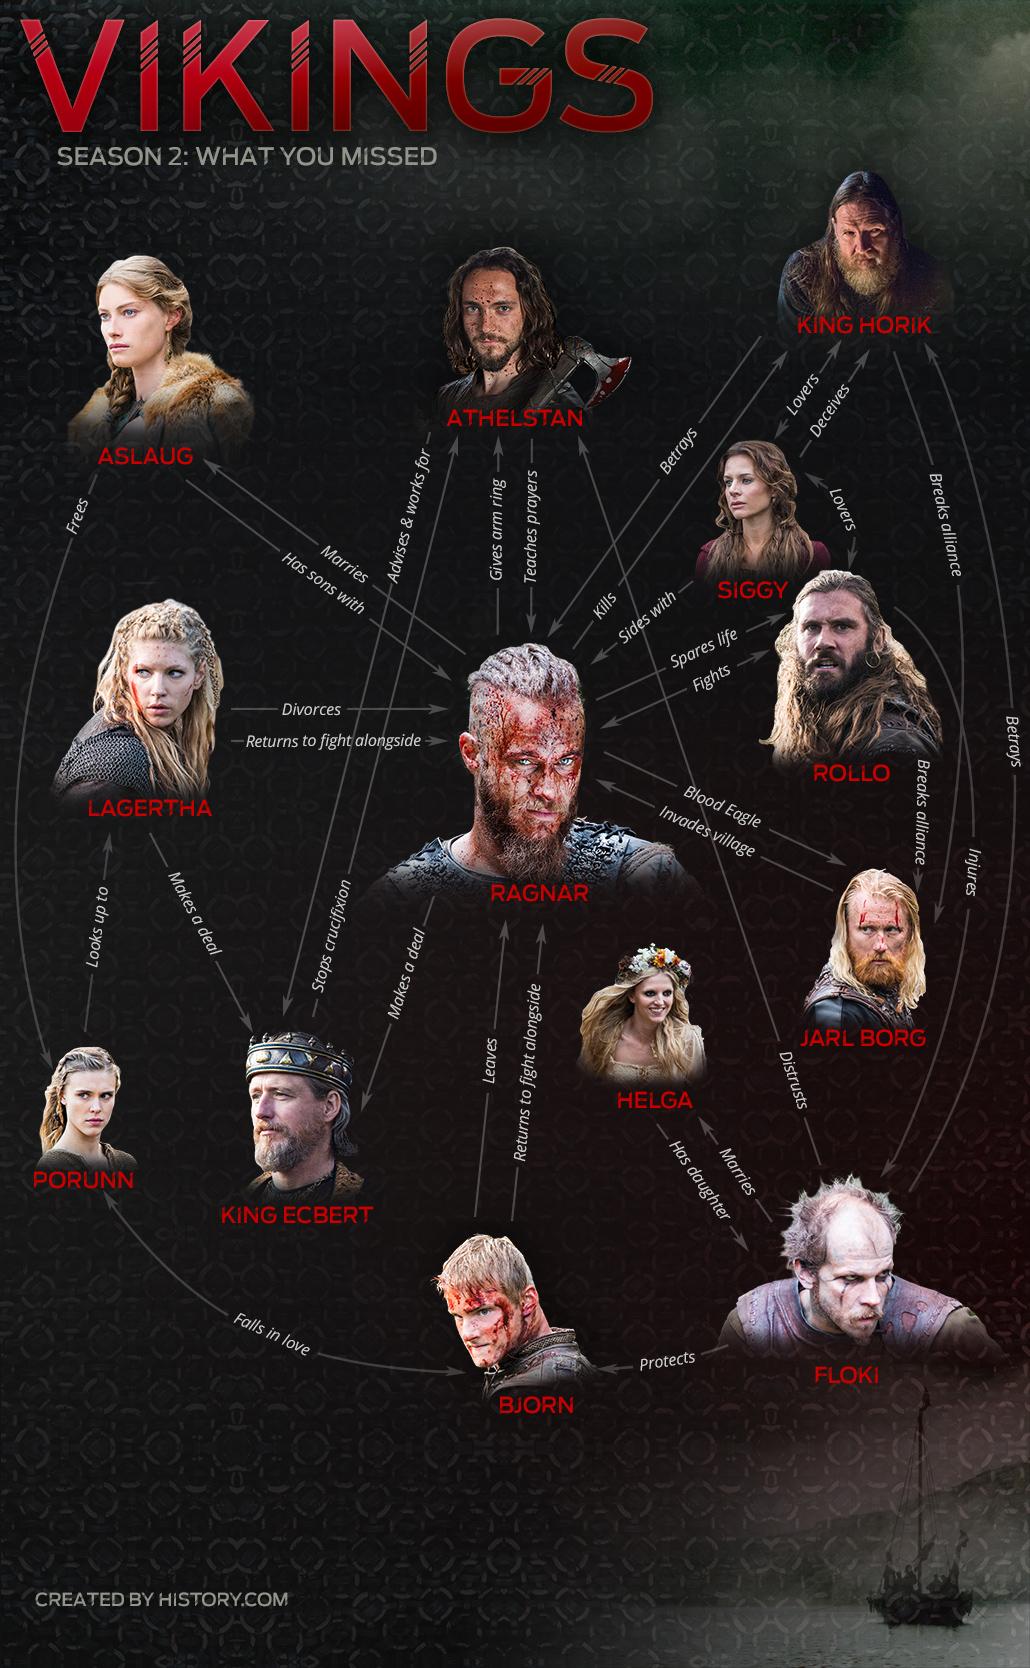 Vikings Season 2 Infographic